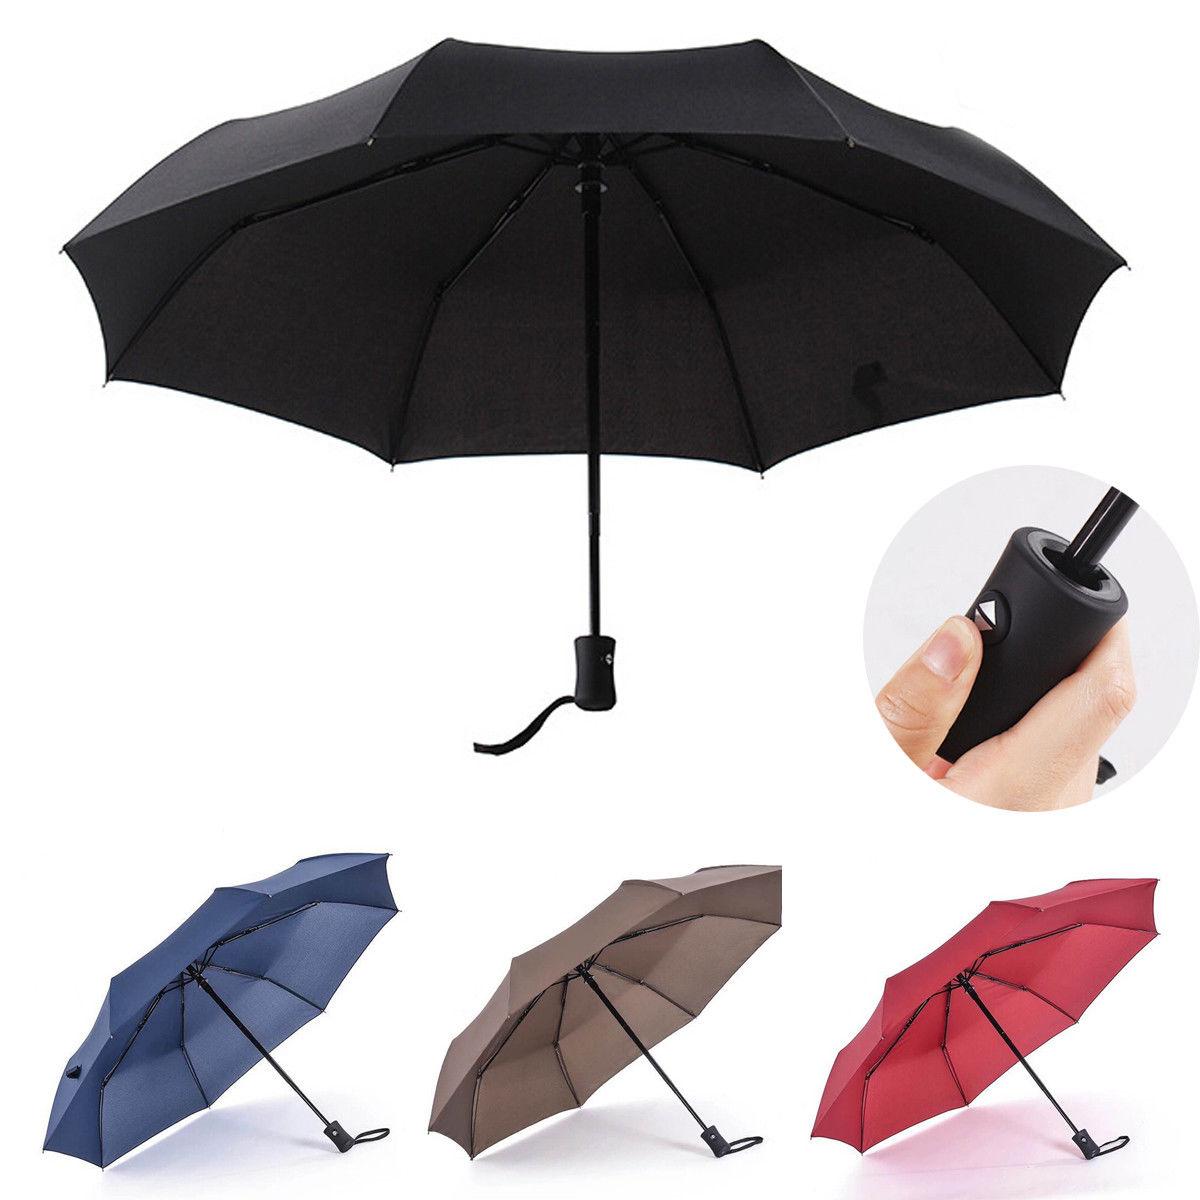 Automatic Travel Umbrella Auto Open Close Compact Folding Windproof Waterproof Umbrella